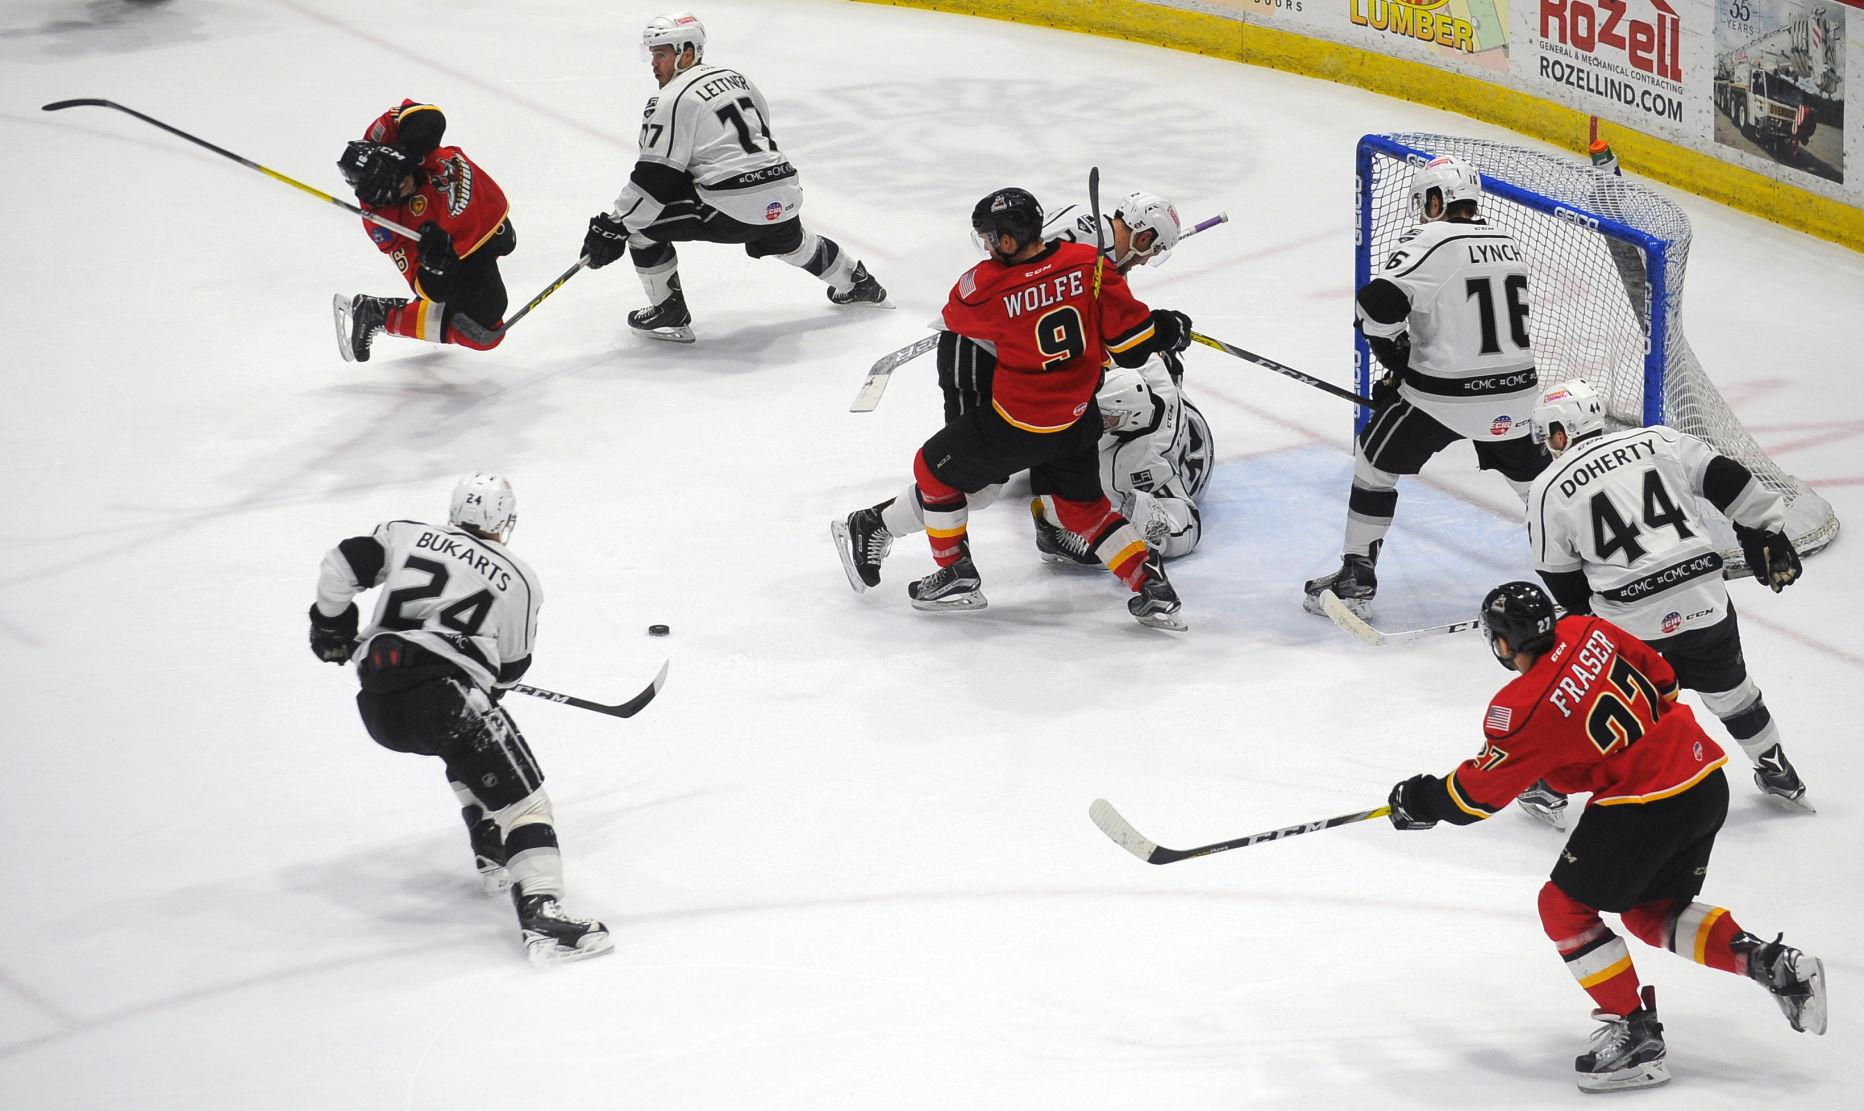 ECHL: Thunder Score 10 To Beat Manchester